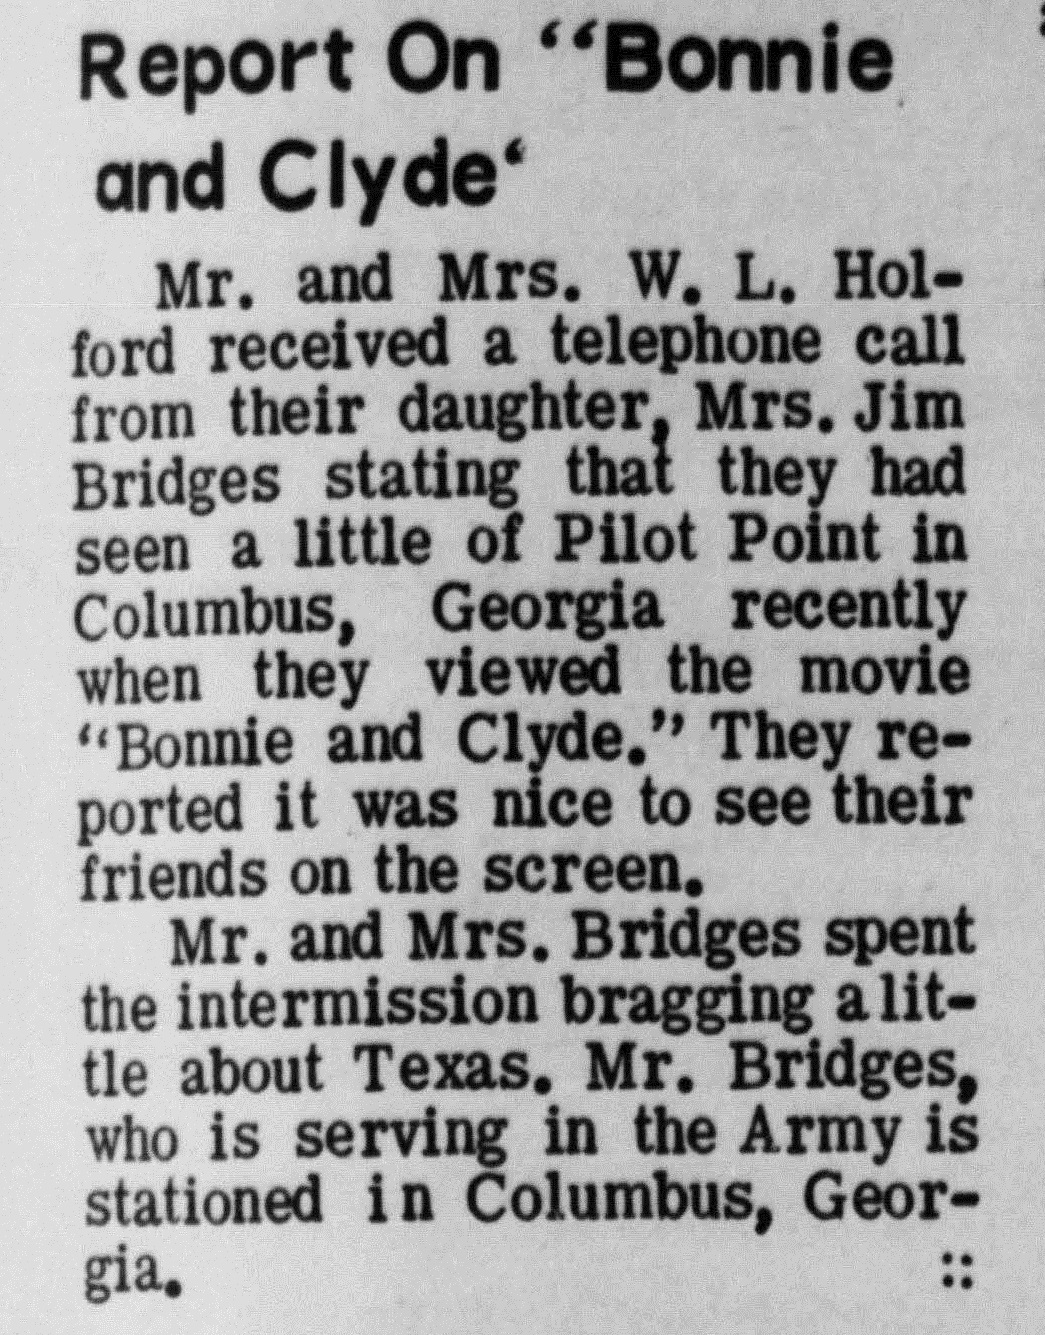 1967_11_16_Thursday_Pilot_Point_Signal_Clip.jpg